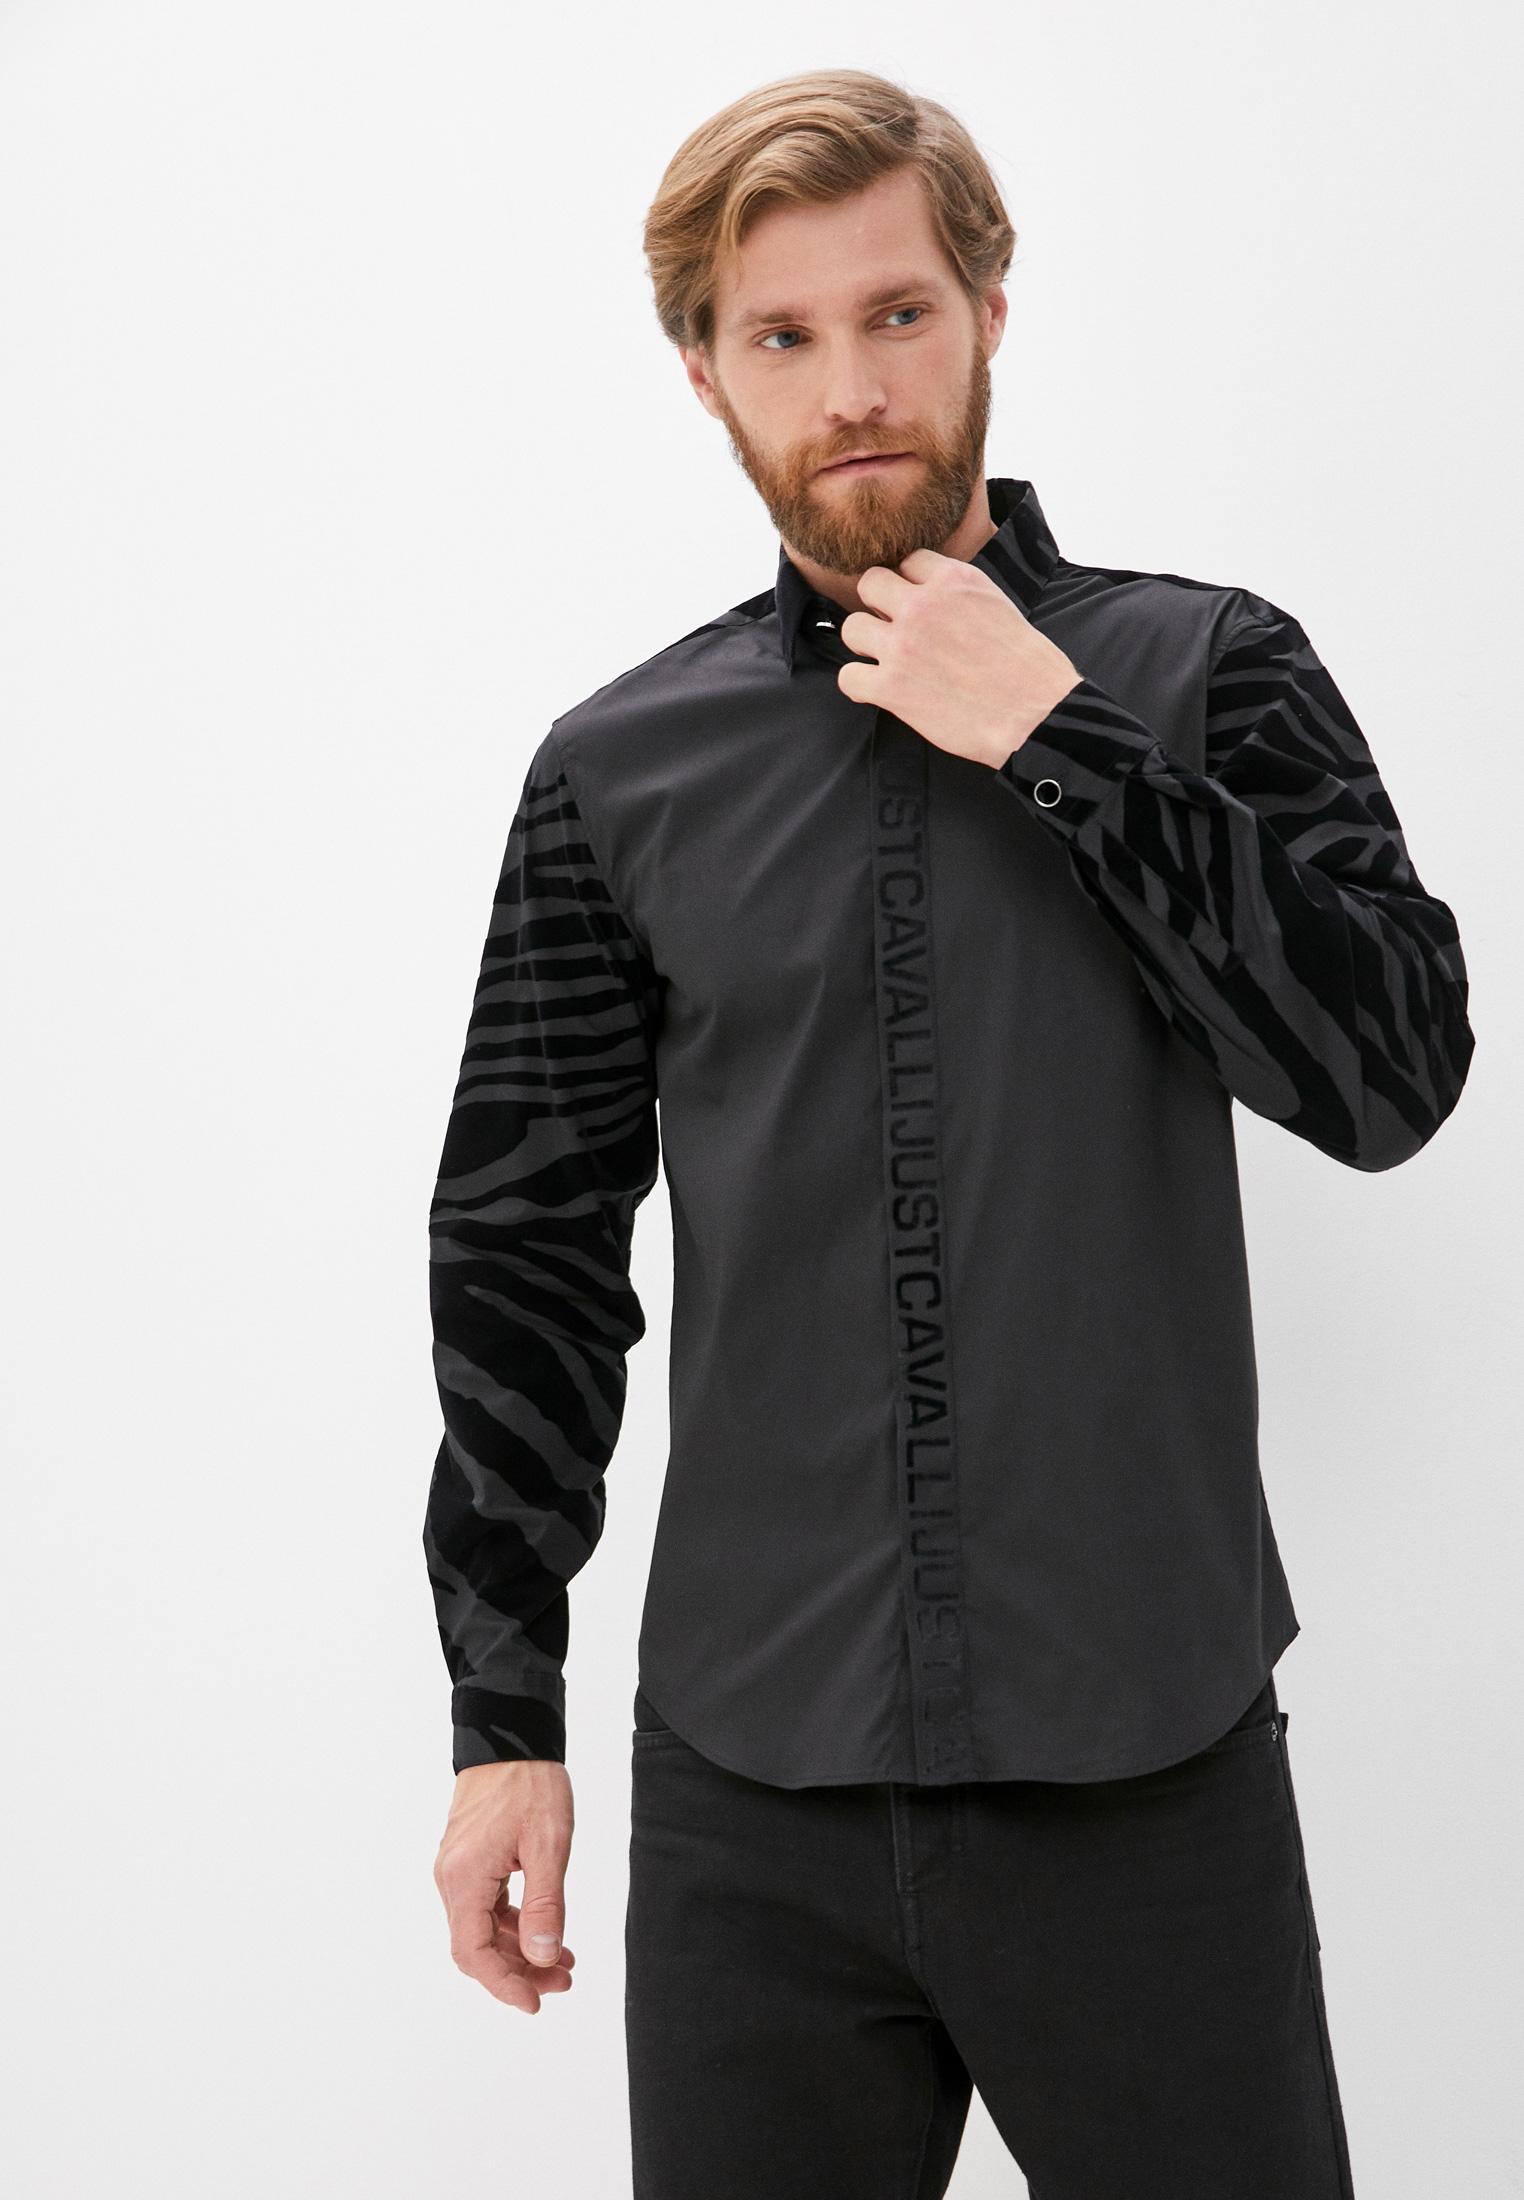 Рубашка с длинным рукавом Just Cavalli (Джаст Кавалли) s03dl0310N39609